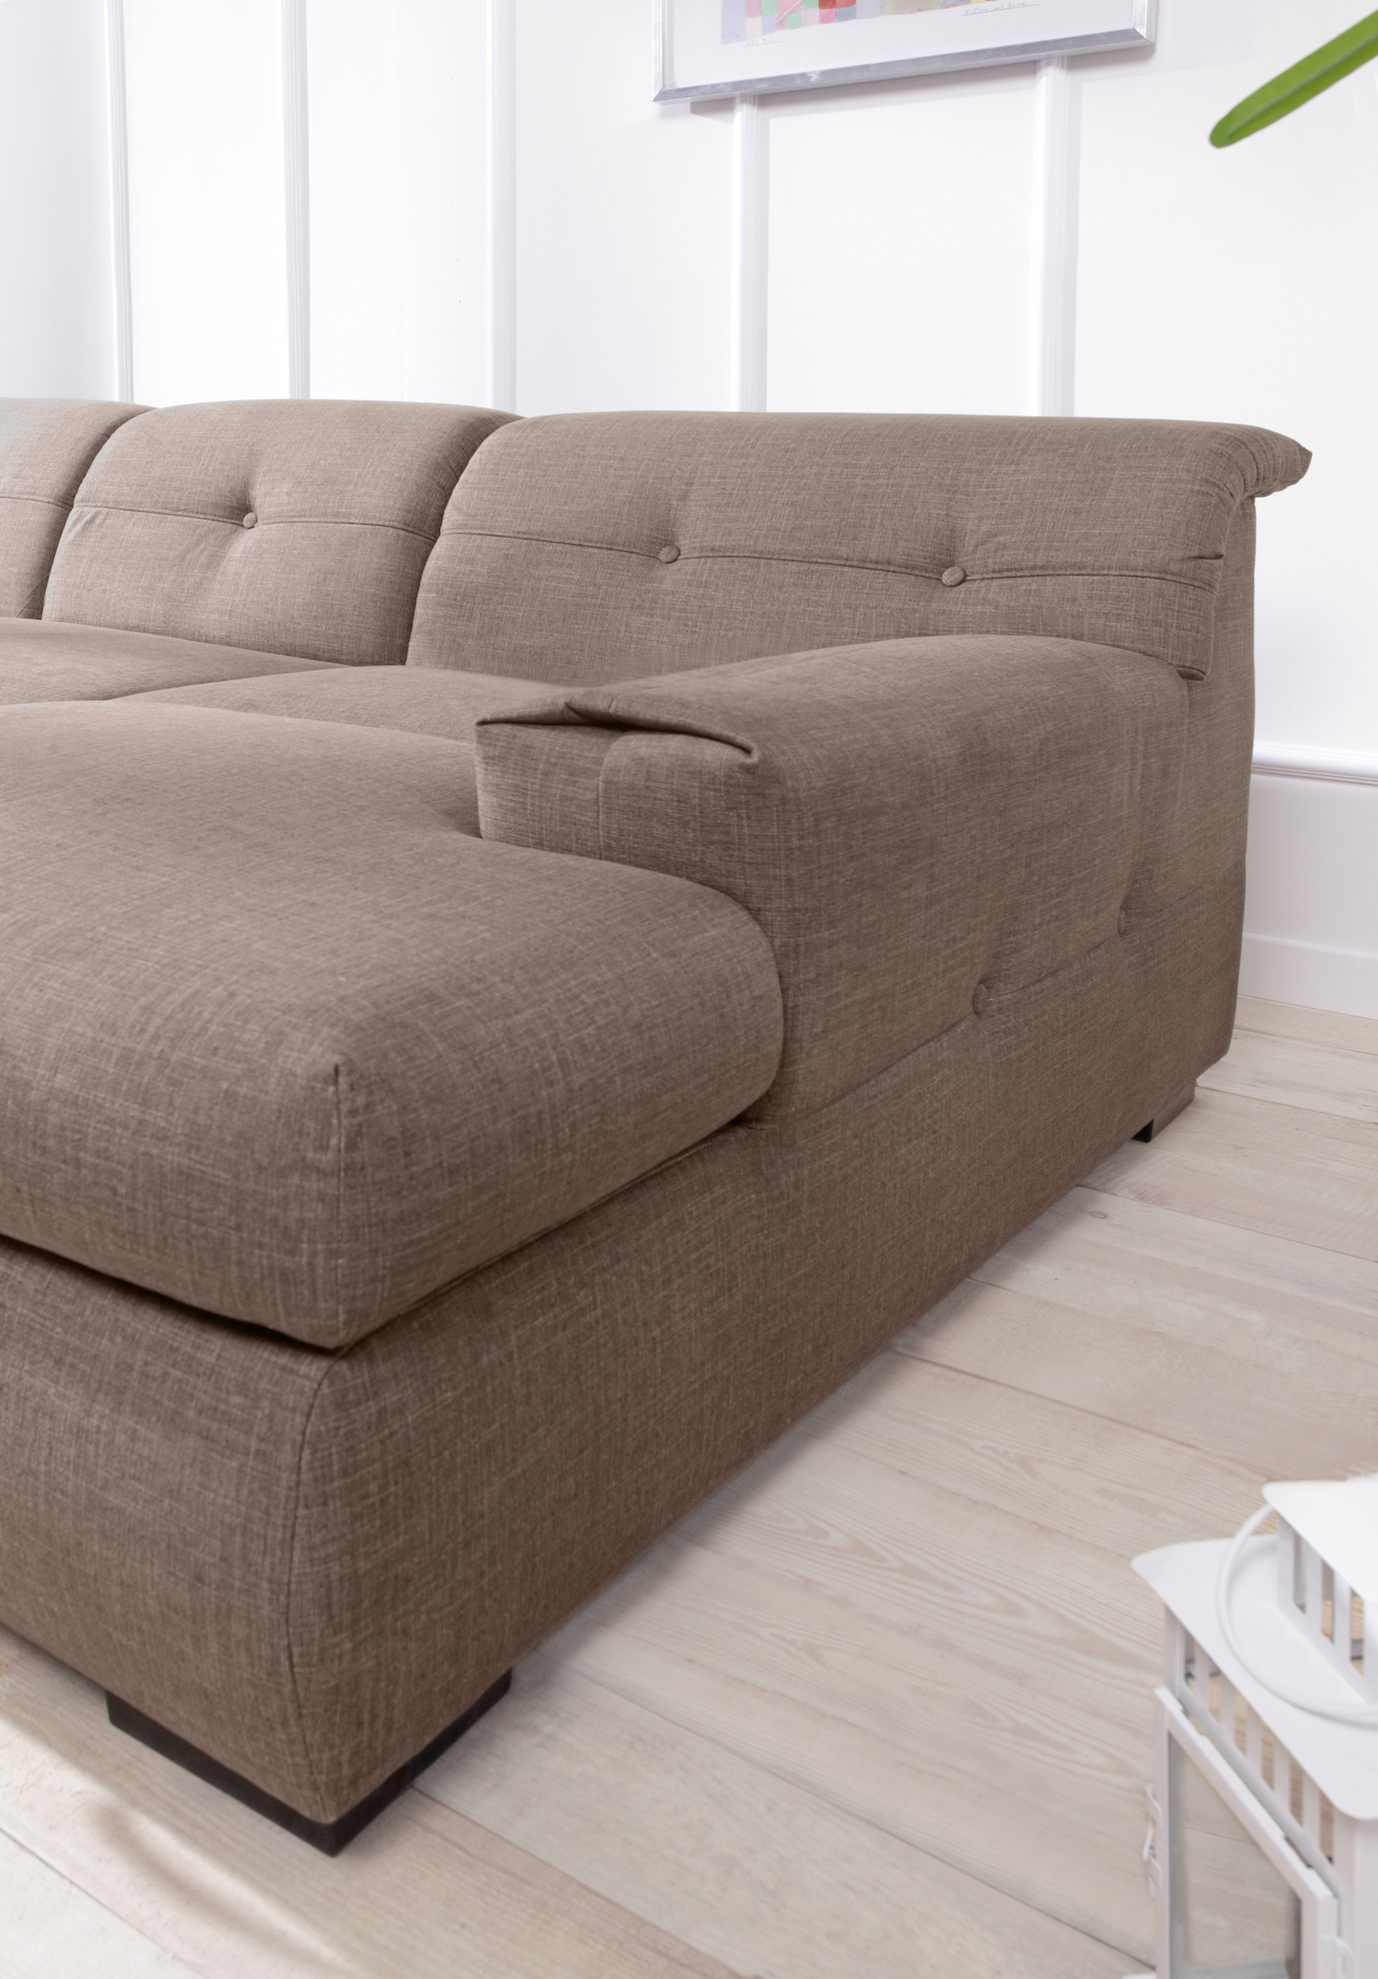 bobochic genova canap convertible angle droit caf latte achat vente canap s pas. Black Bedroom Furniture Sets. Home Design Ideas